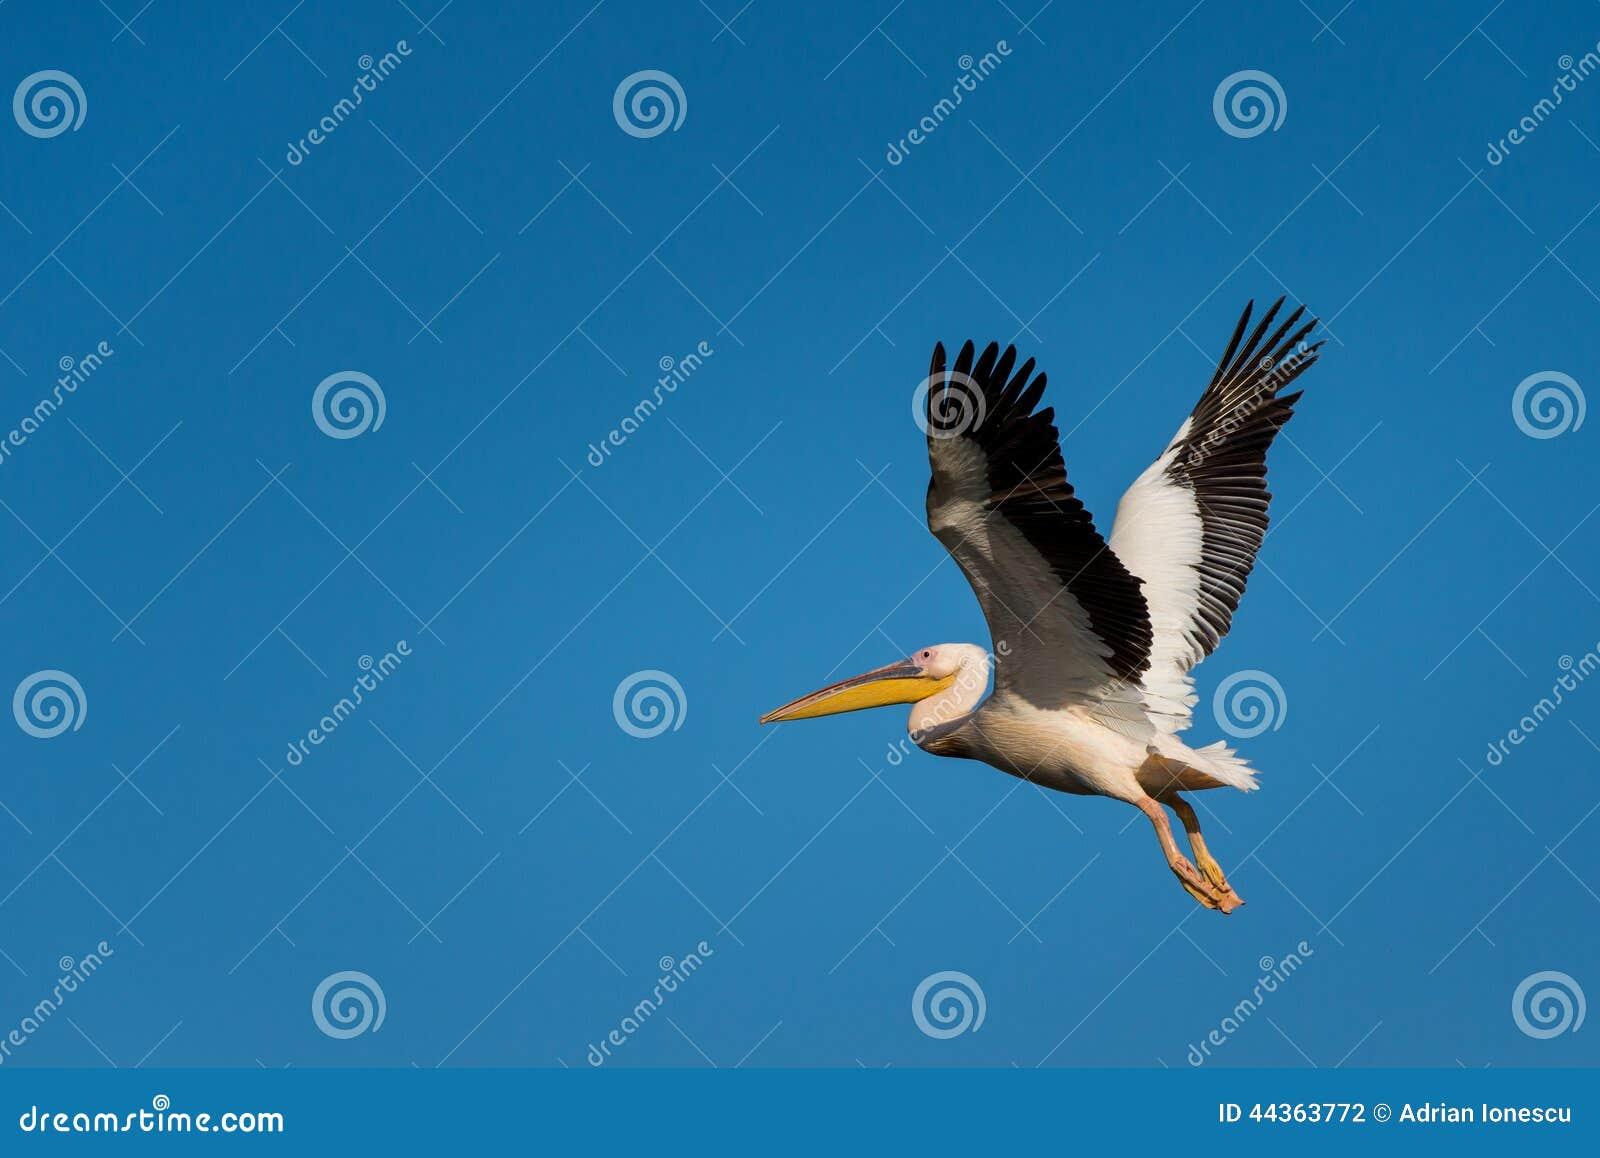 Volo del pellicano